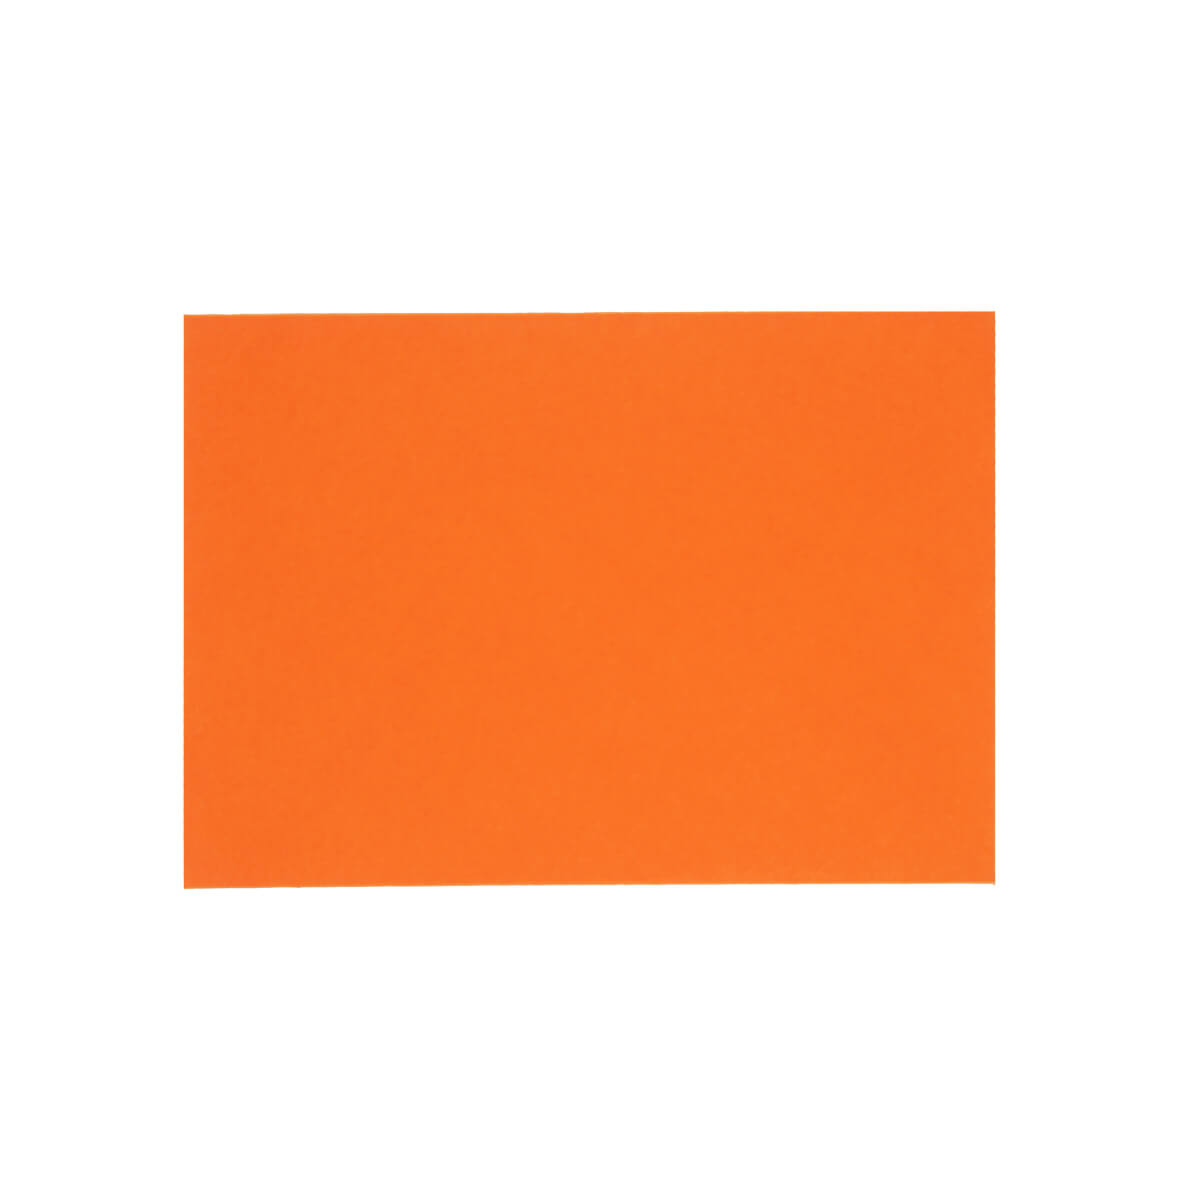 ORANGE 70 x 100 mm GIFT TAG ENVELOPE (i2)